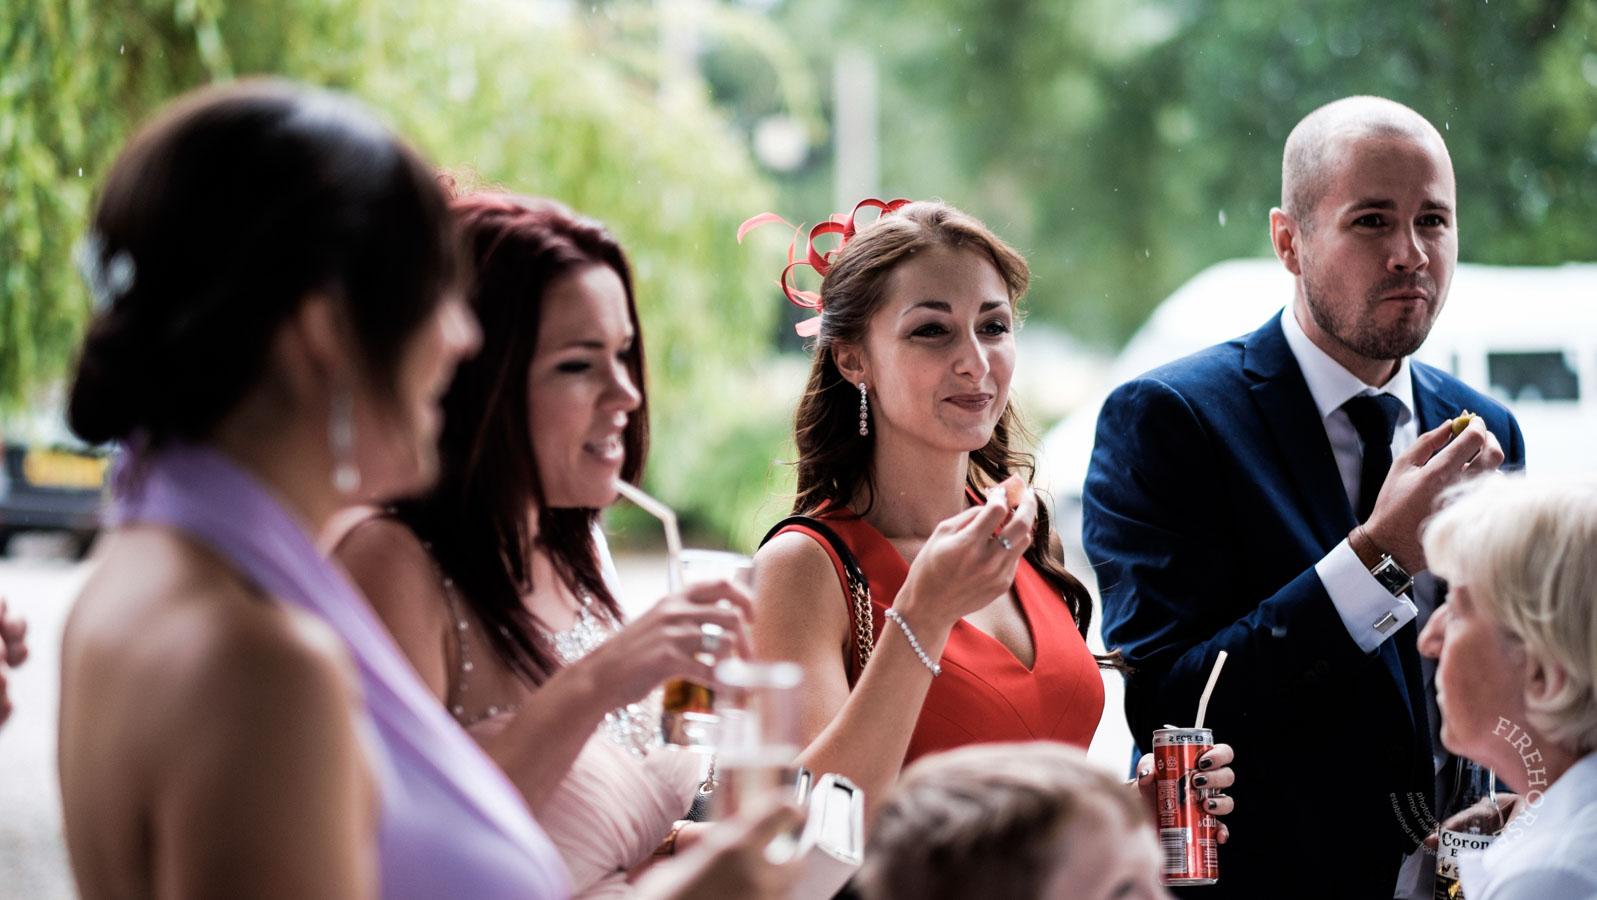 Sportsmans-Arms-Wedding-031